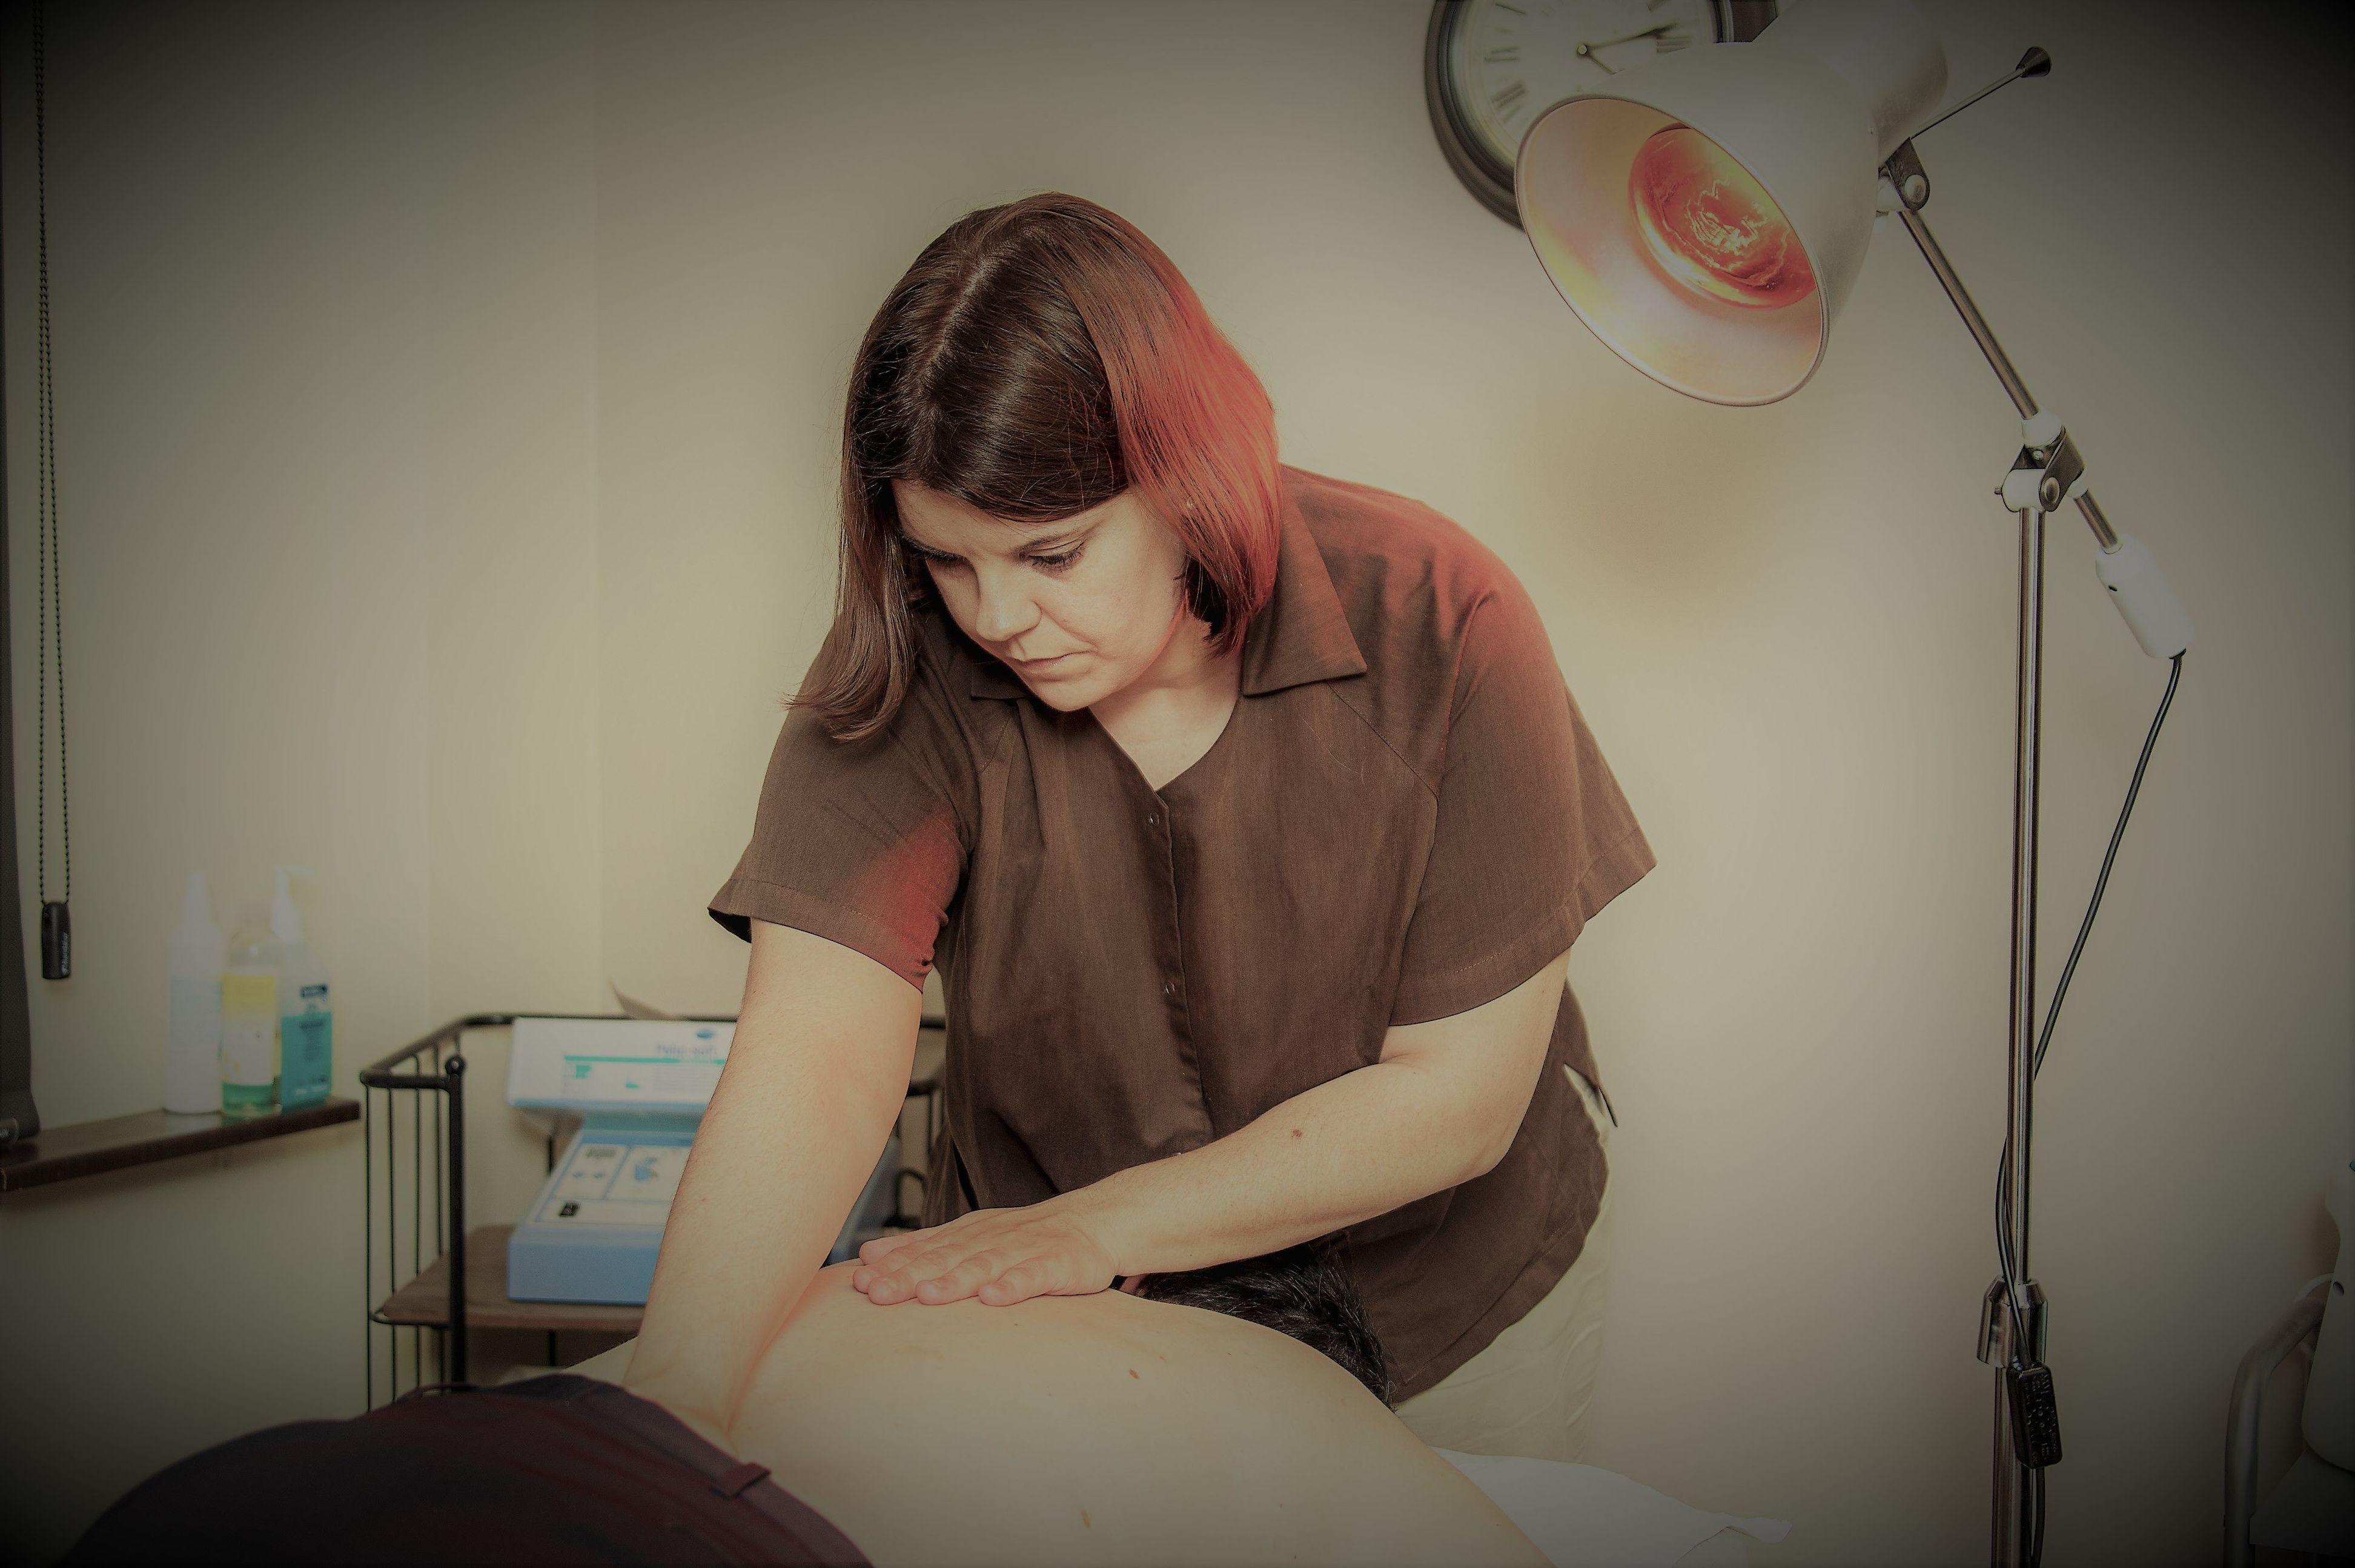 Foto 6 de Fisioterapia y osteopatía preventiva en San Pedro Alcántara | Osteophysix